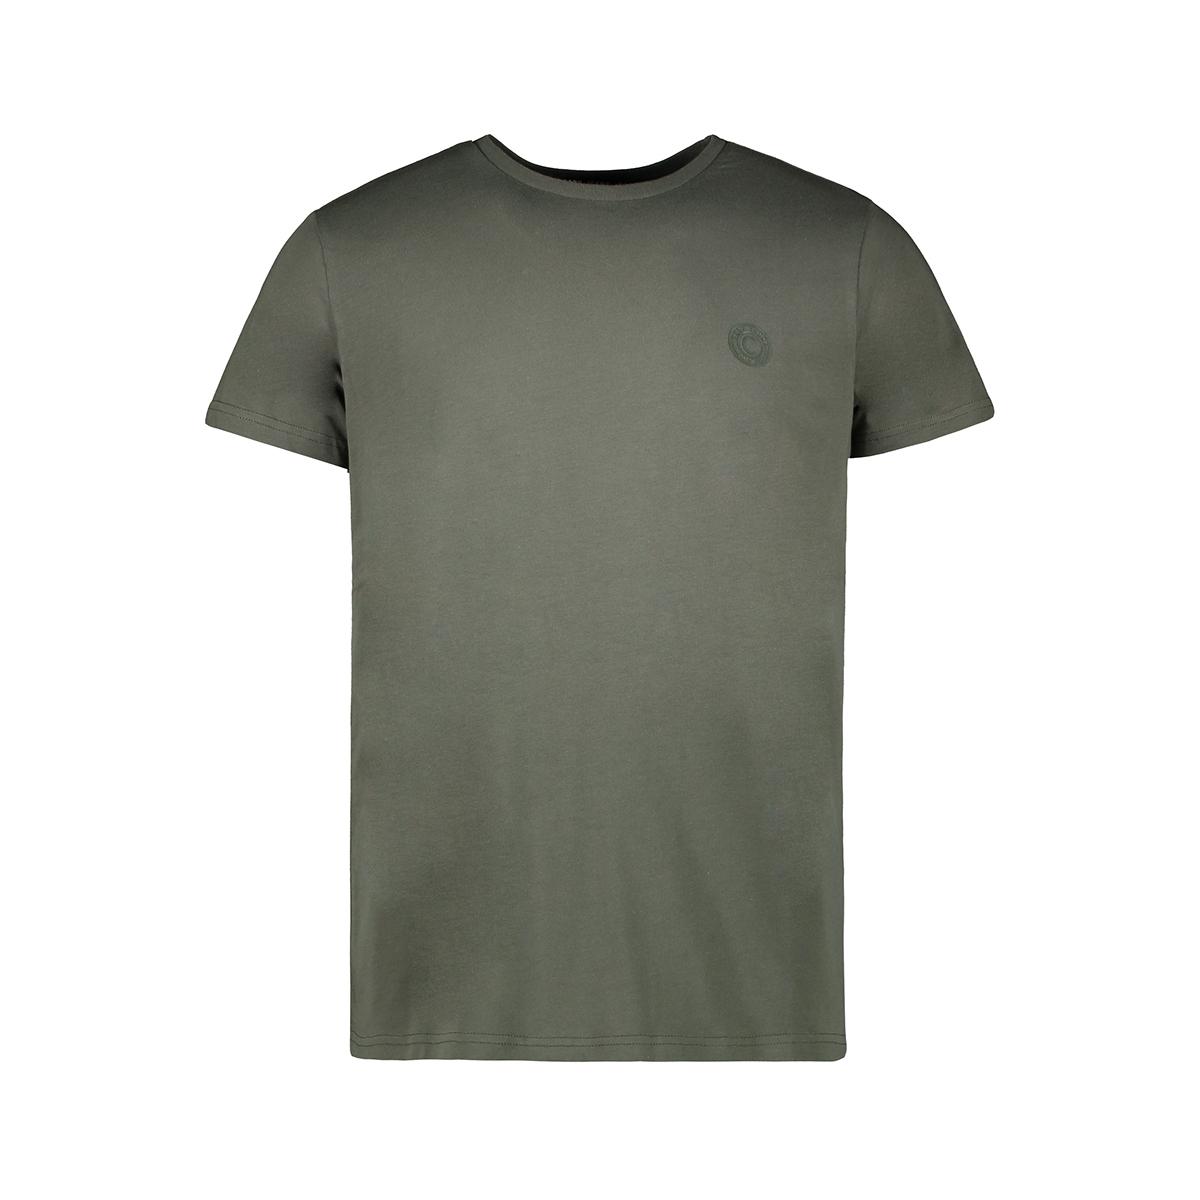 fulton ts 42012 cars t-shirt 19 army